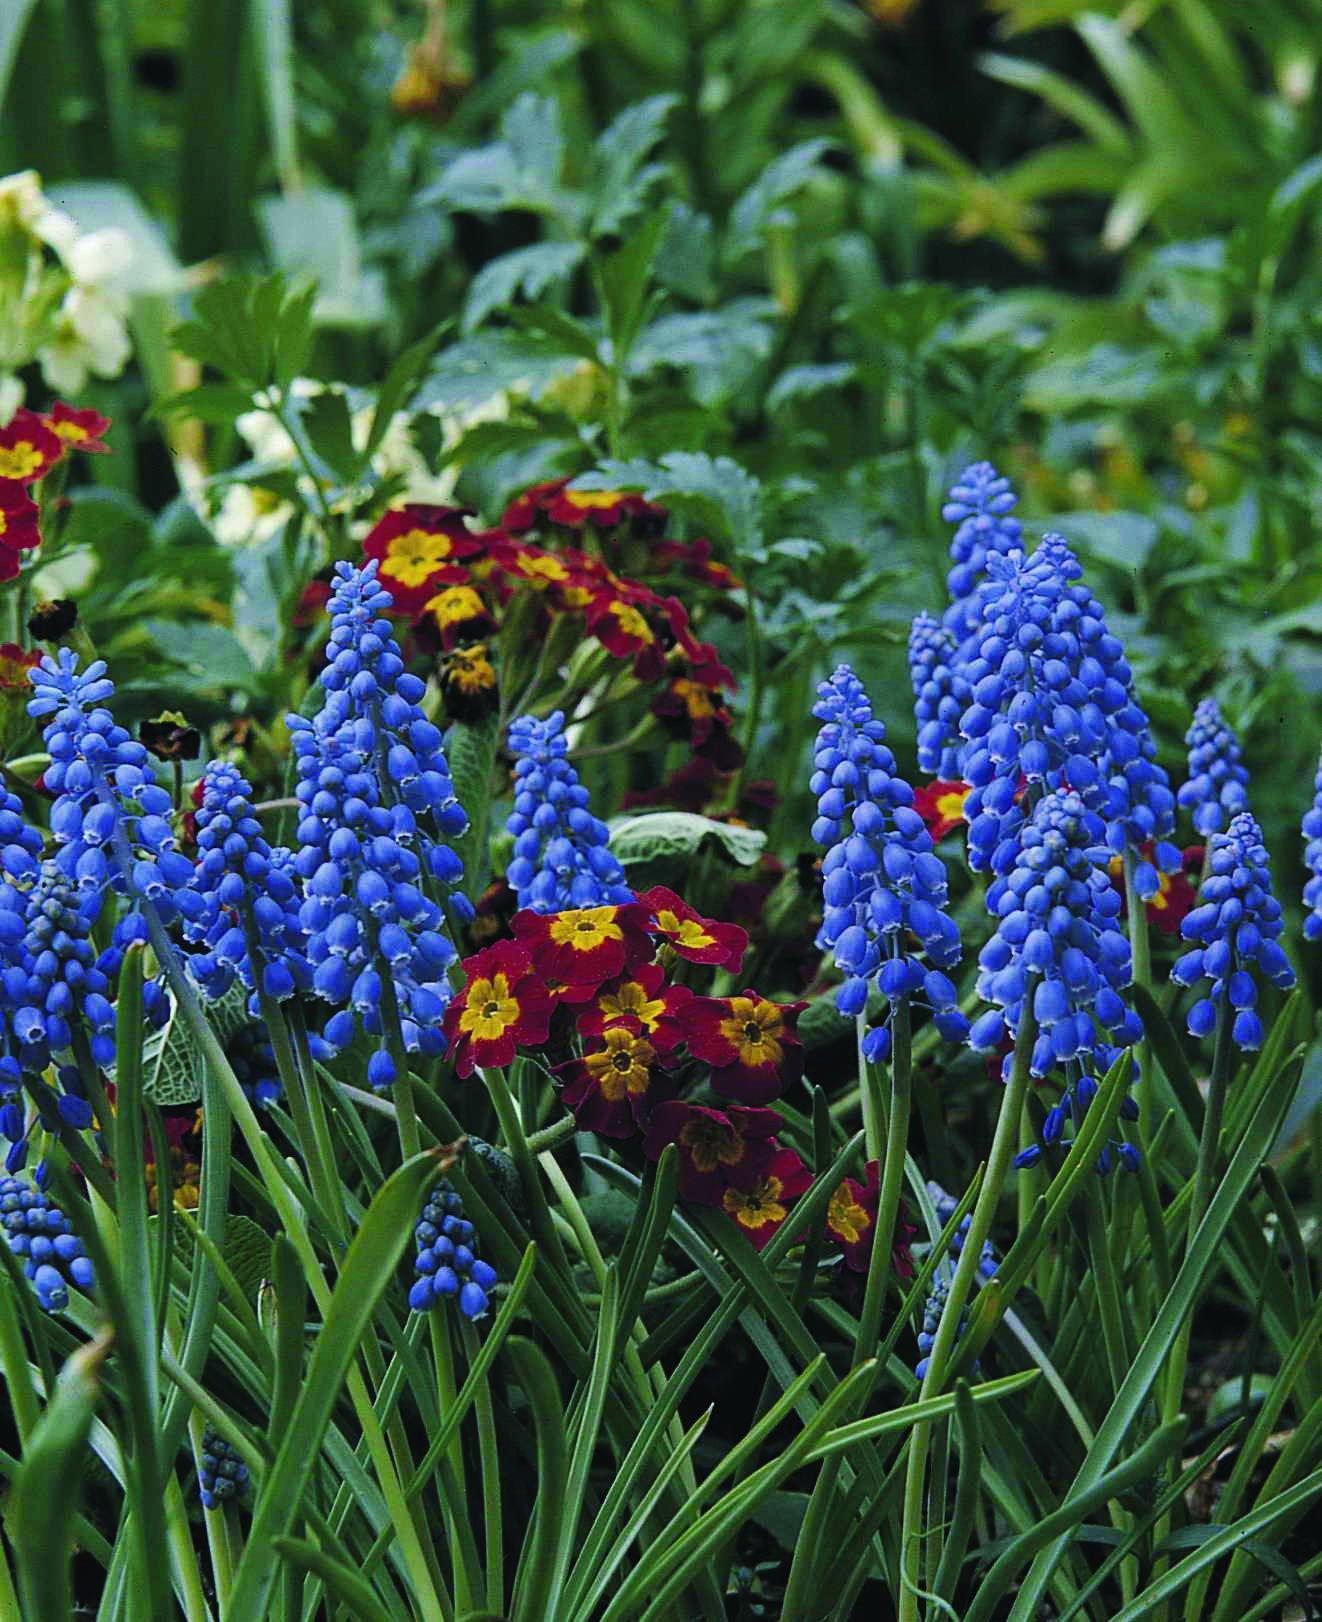 Burpee's Blue Grape Muscari - 16 Flower Bulbs | Blue | 16 - 18cm Bulb Diameter